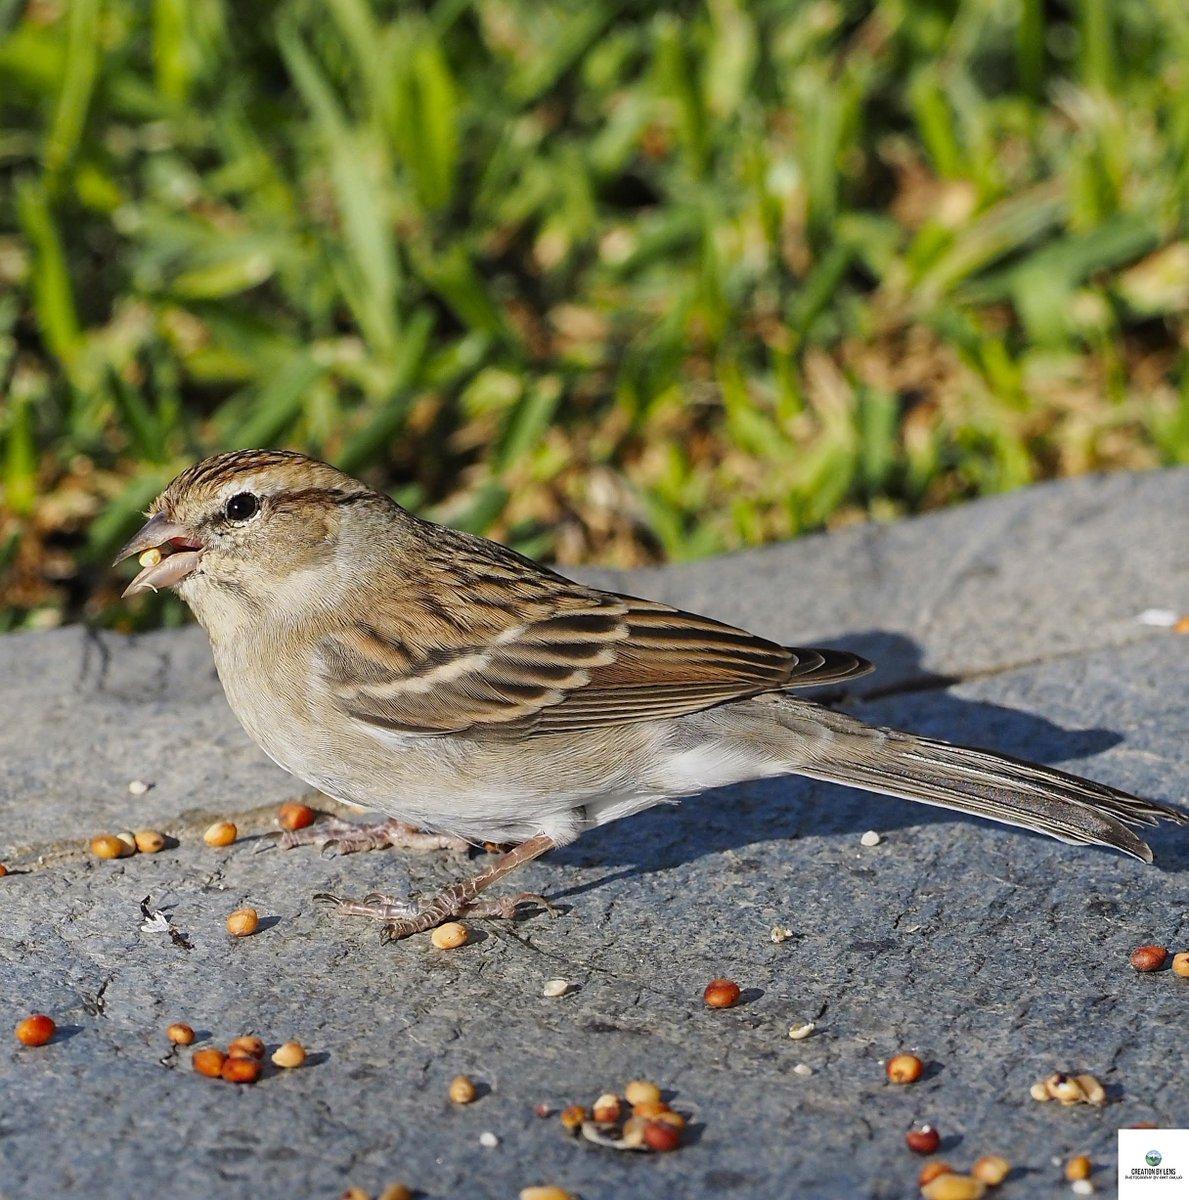 Snack Time! #birdphotography #birdsofinstagram #birdwatching #blackphoebe #wildlife #photographer #photography #wildlifephotography  #birdphotography #macrophotograph #olympusphotography @LensAreLive @ThePhotoHour https://t.co/62u7puYfRk